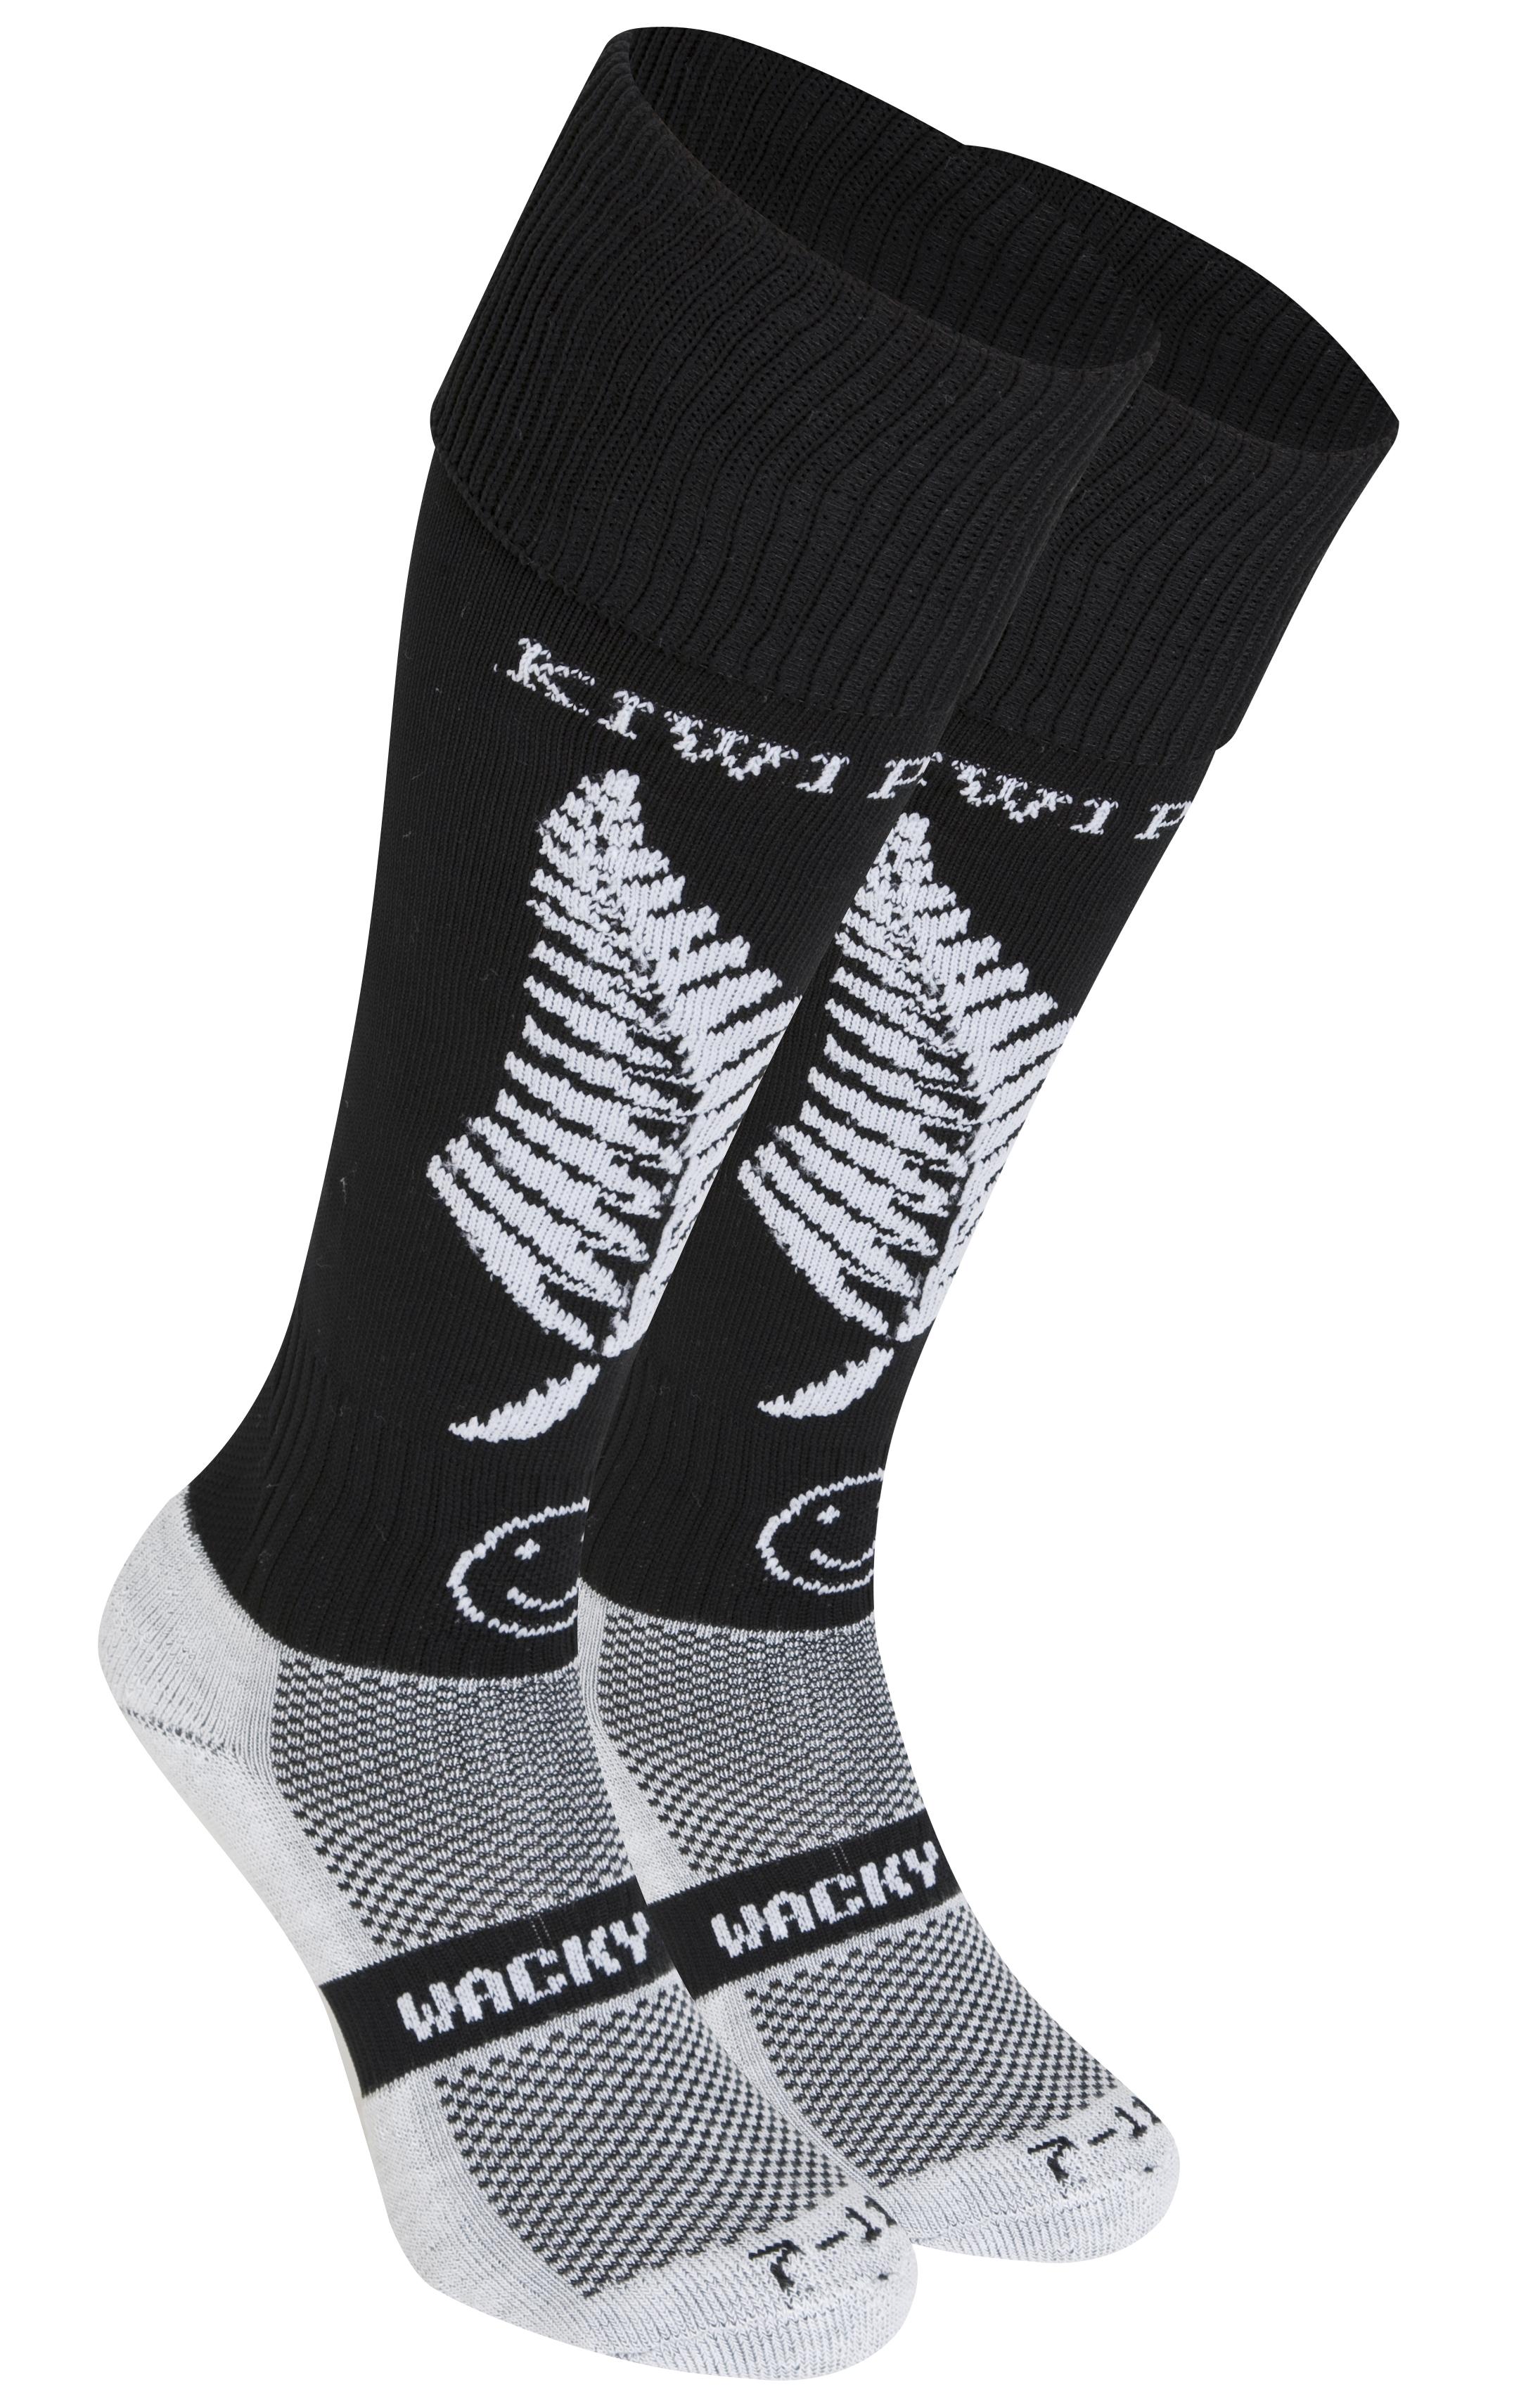 Wacky Sox New Zealand Socks - Black/White - Size 12-14